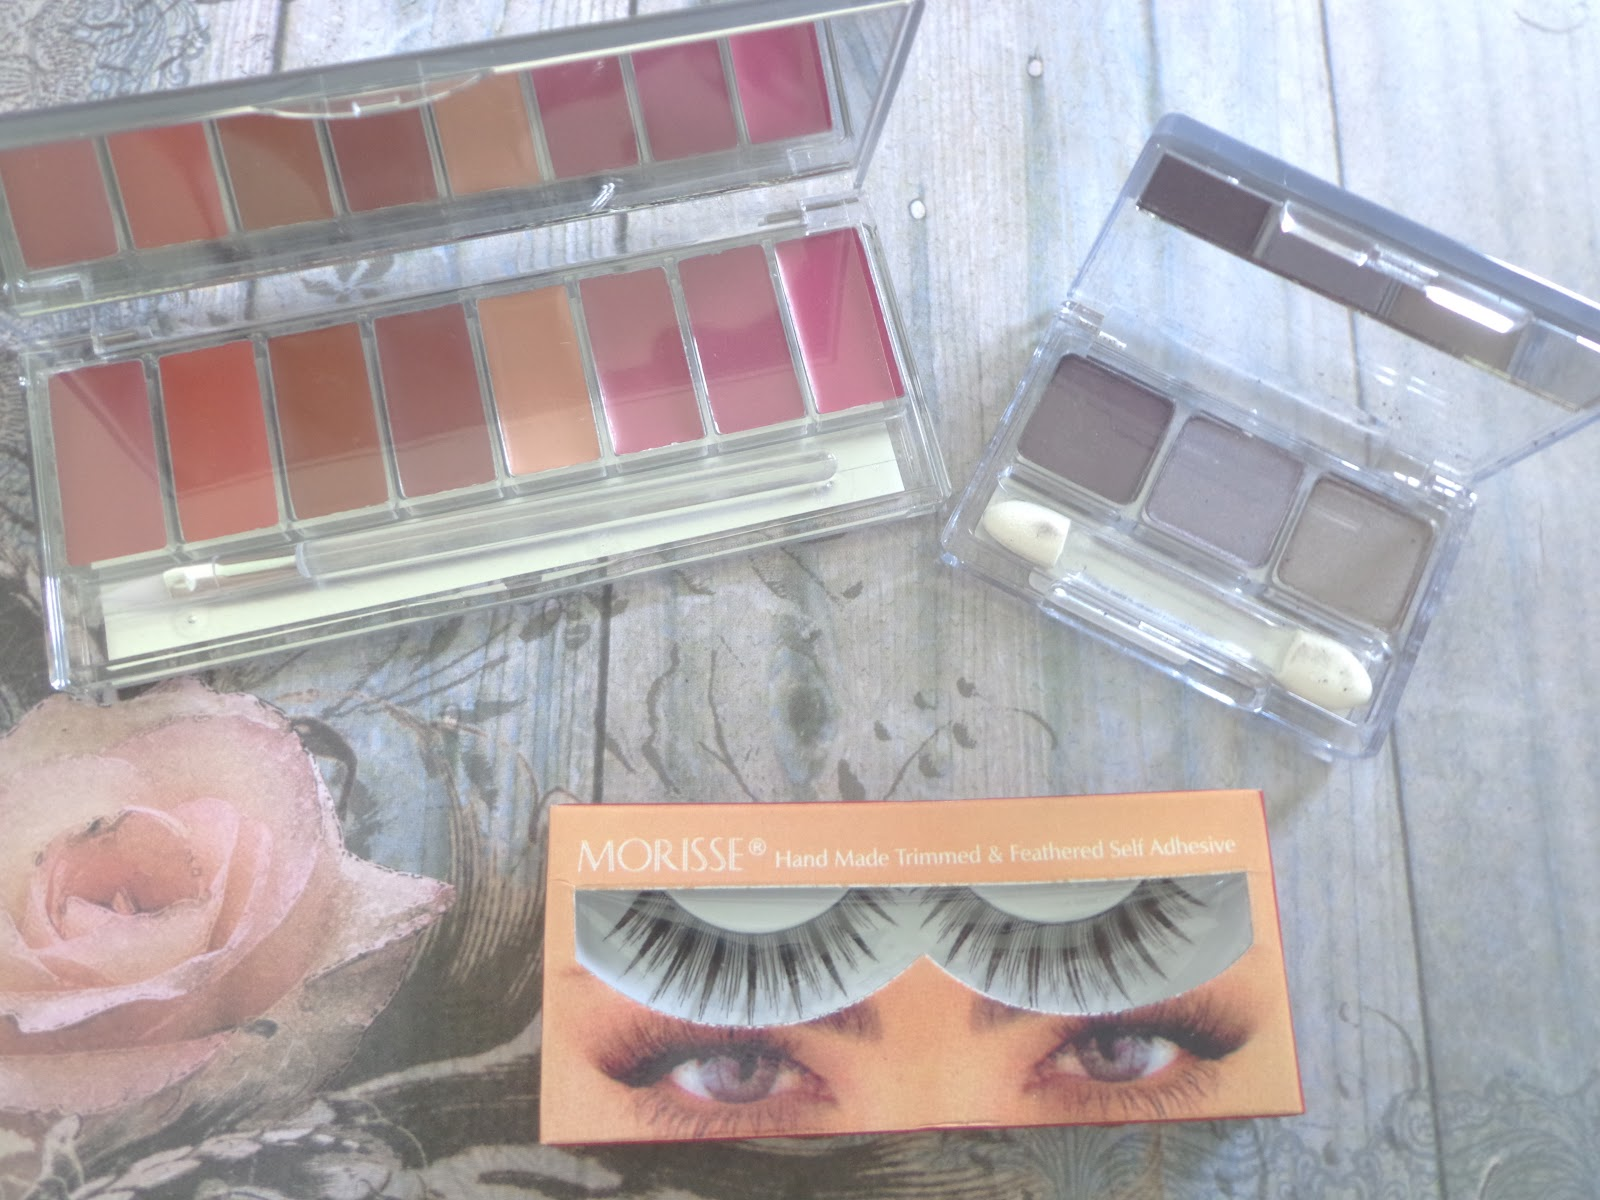 Chocolicious: Wardah Lip Pallete, Wardah Eyeshadow, and